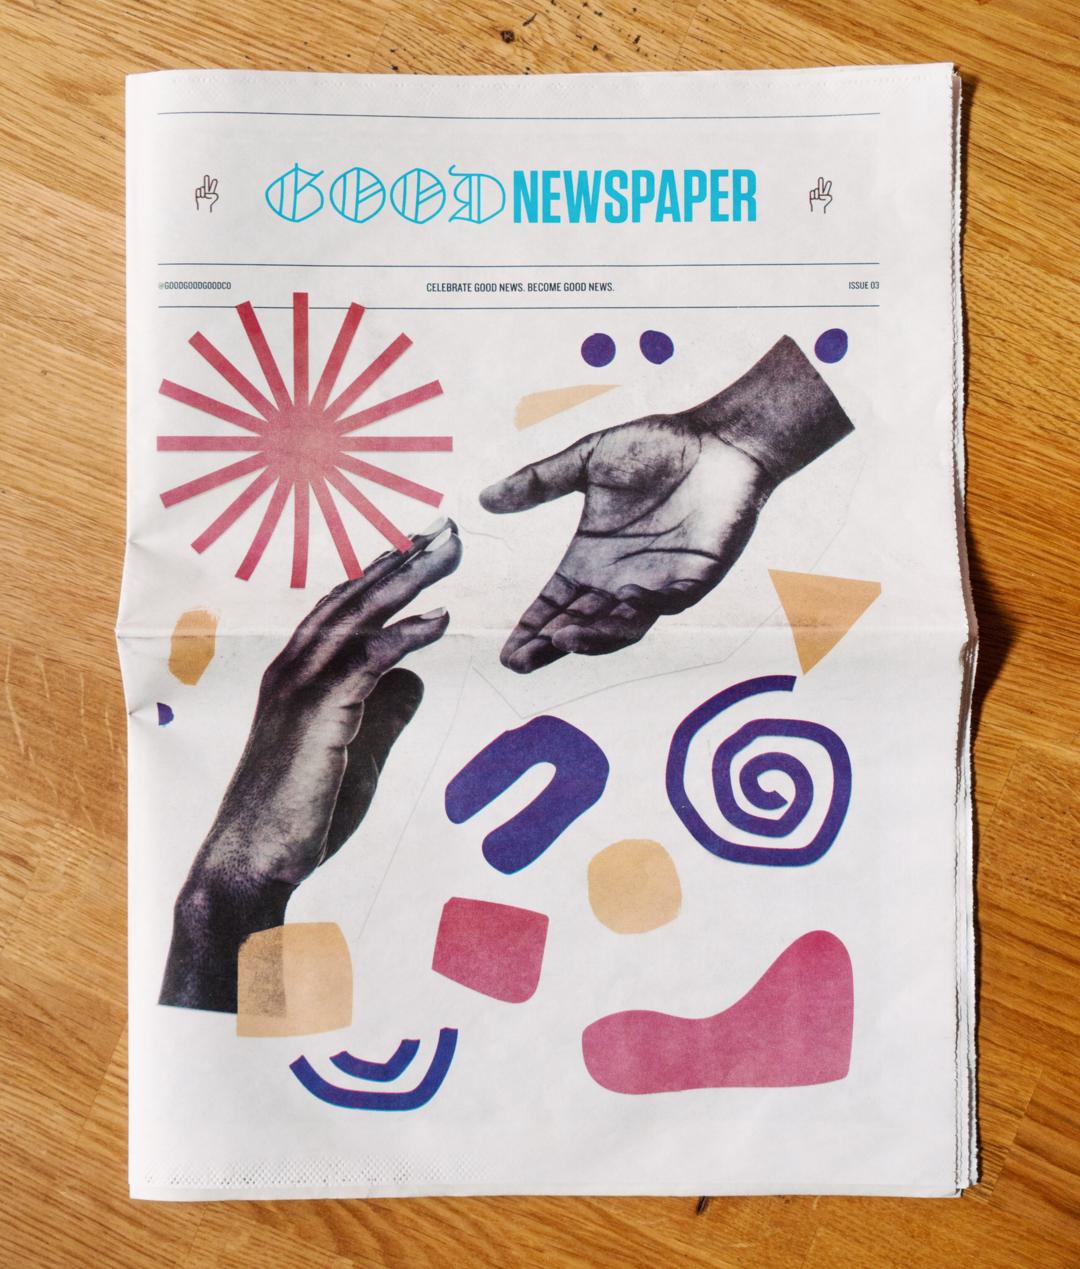 Goodnewspaper Issue 03 at Good Good Good with Branden Harvey interview with Ilwad Elman